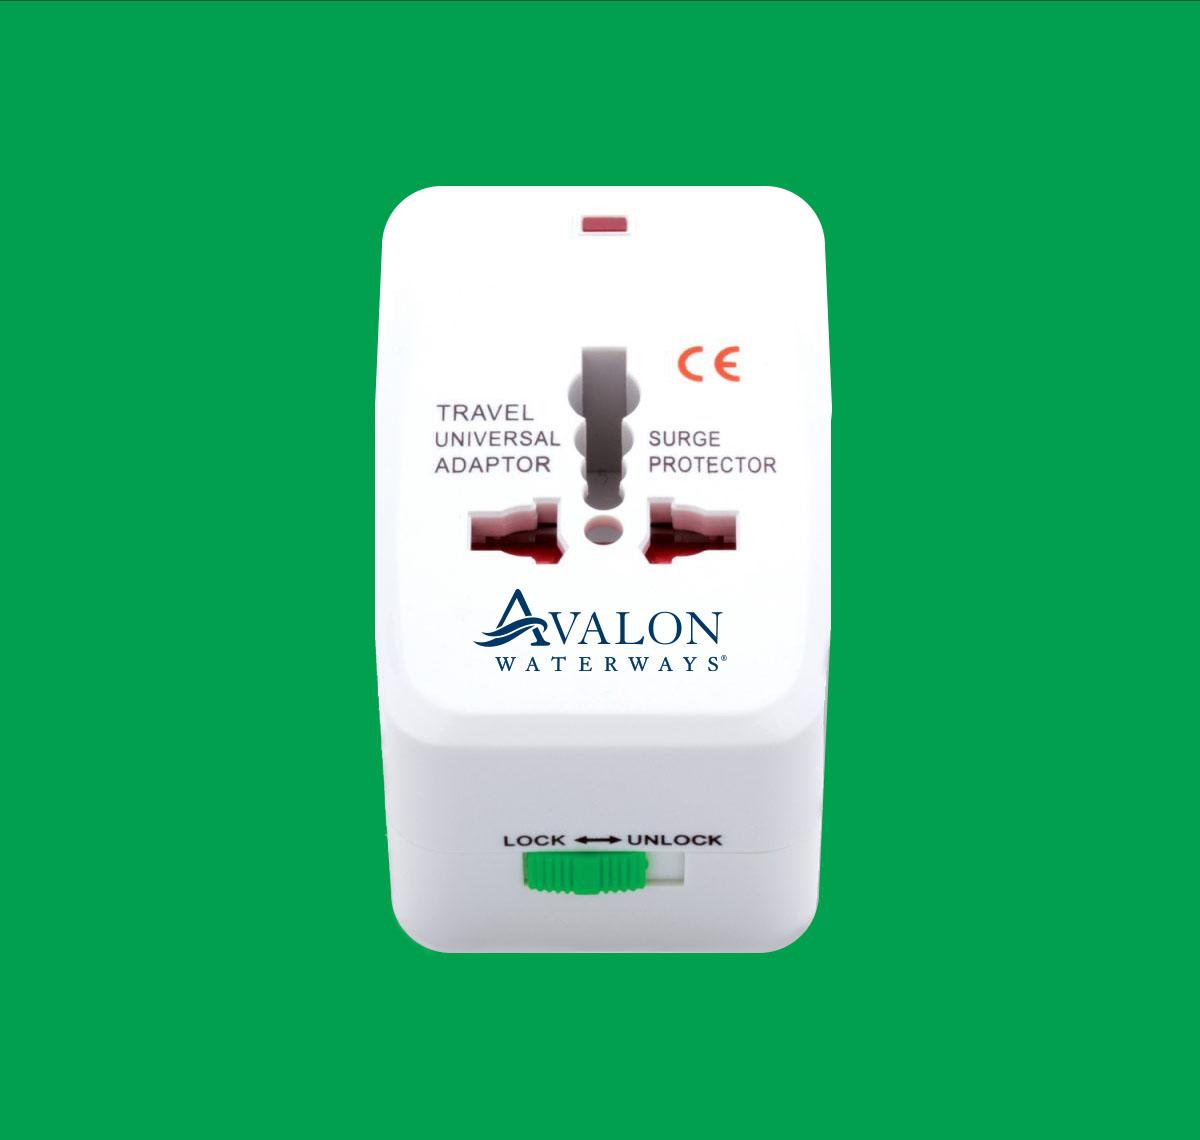 Avalon Travel Adapter